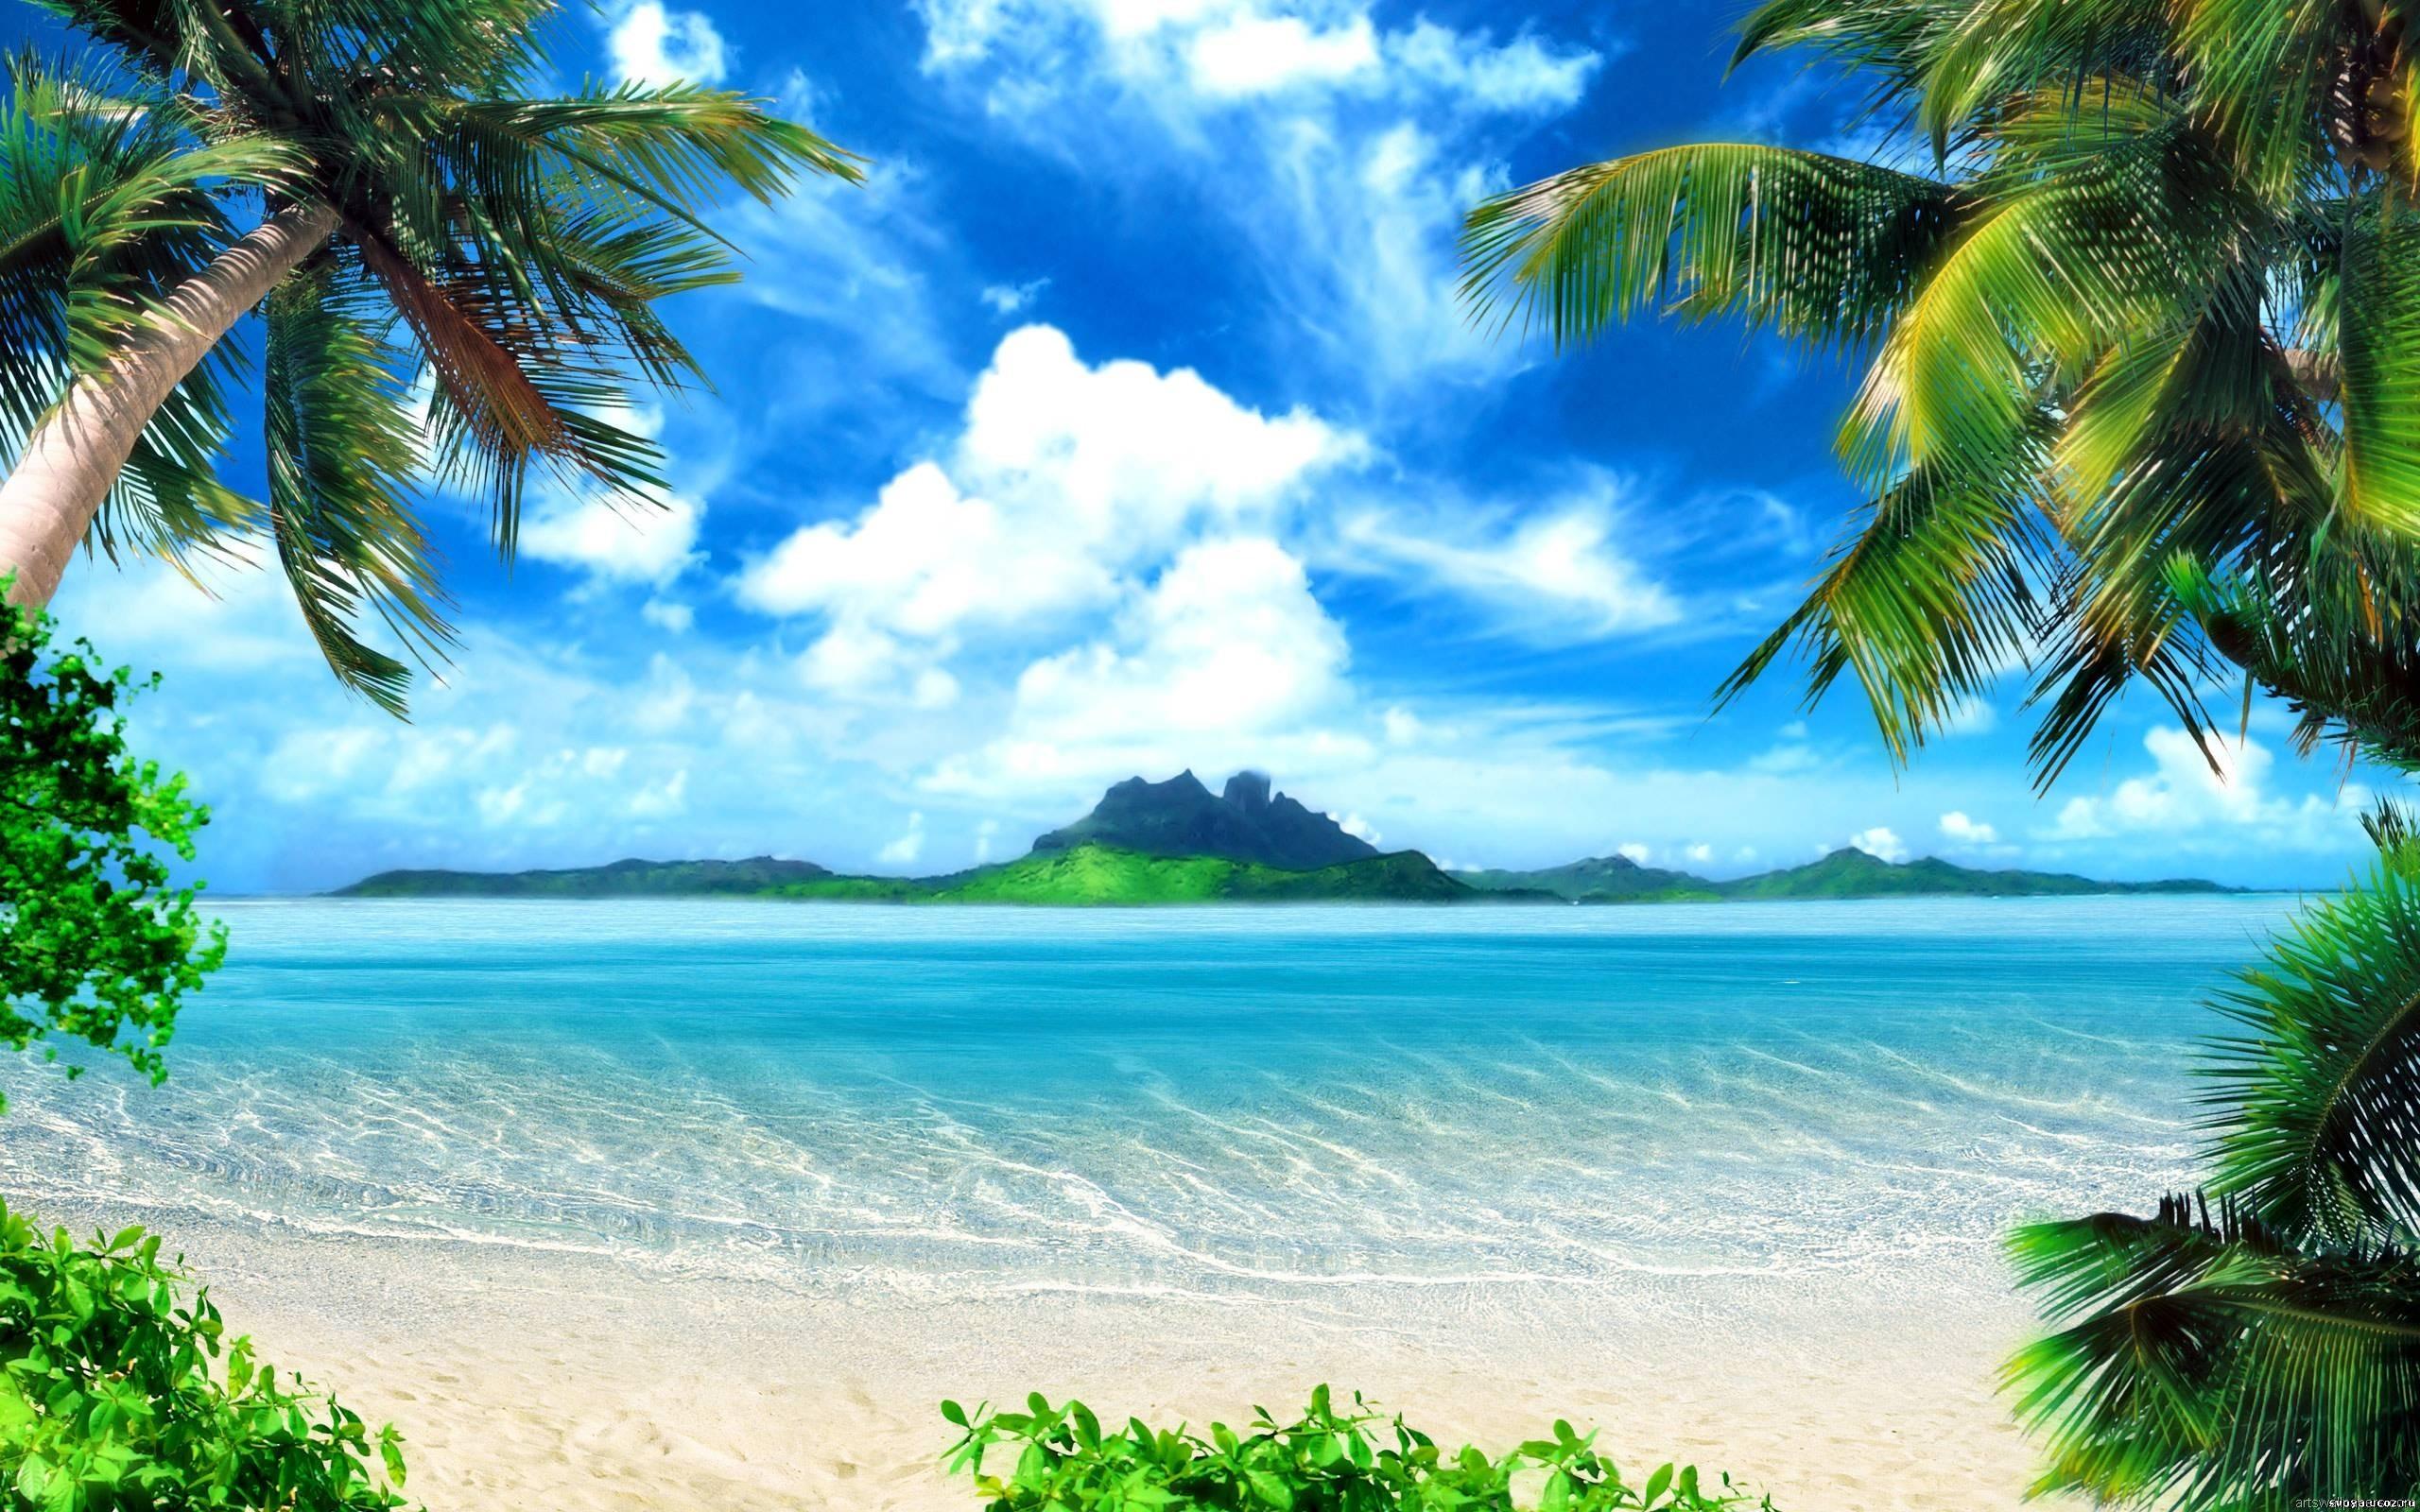 Like or share Sea Ocean Wallpaper Hd Full Hd 1080p Desktop Wallpaper .